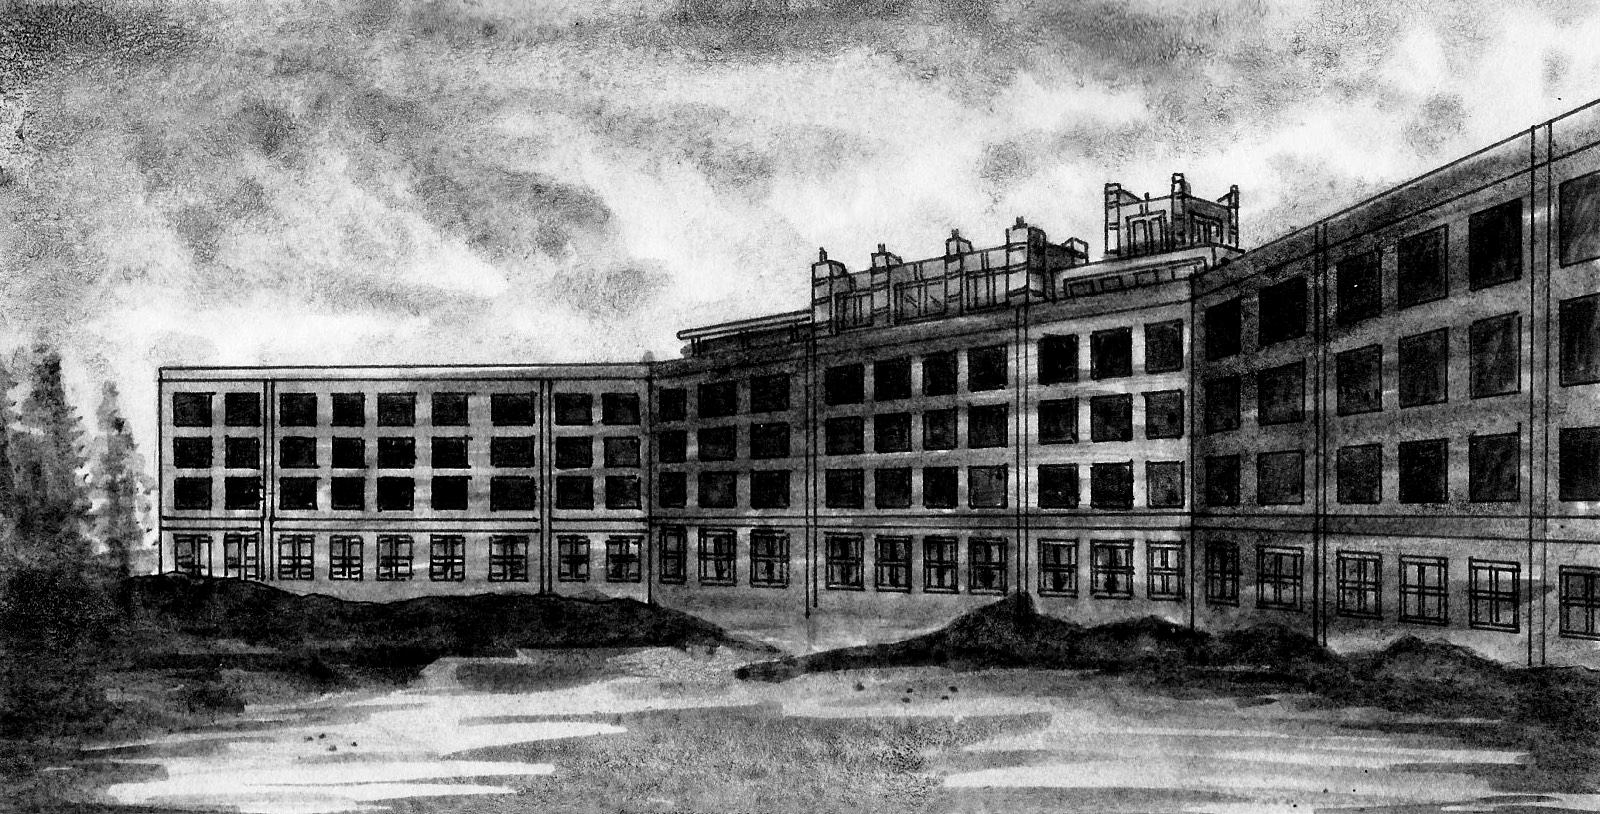 Waverly Hill Sanitorium